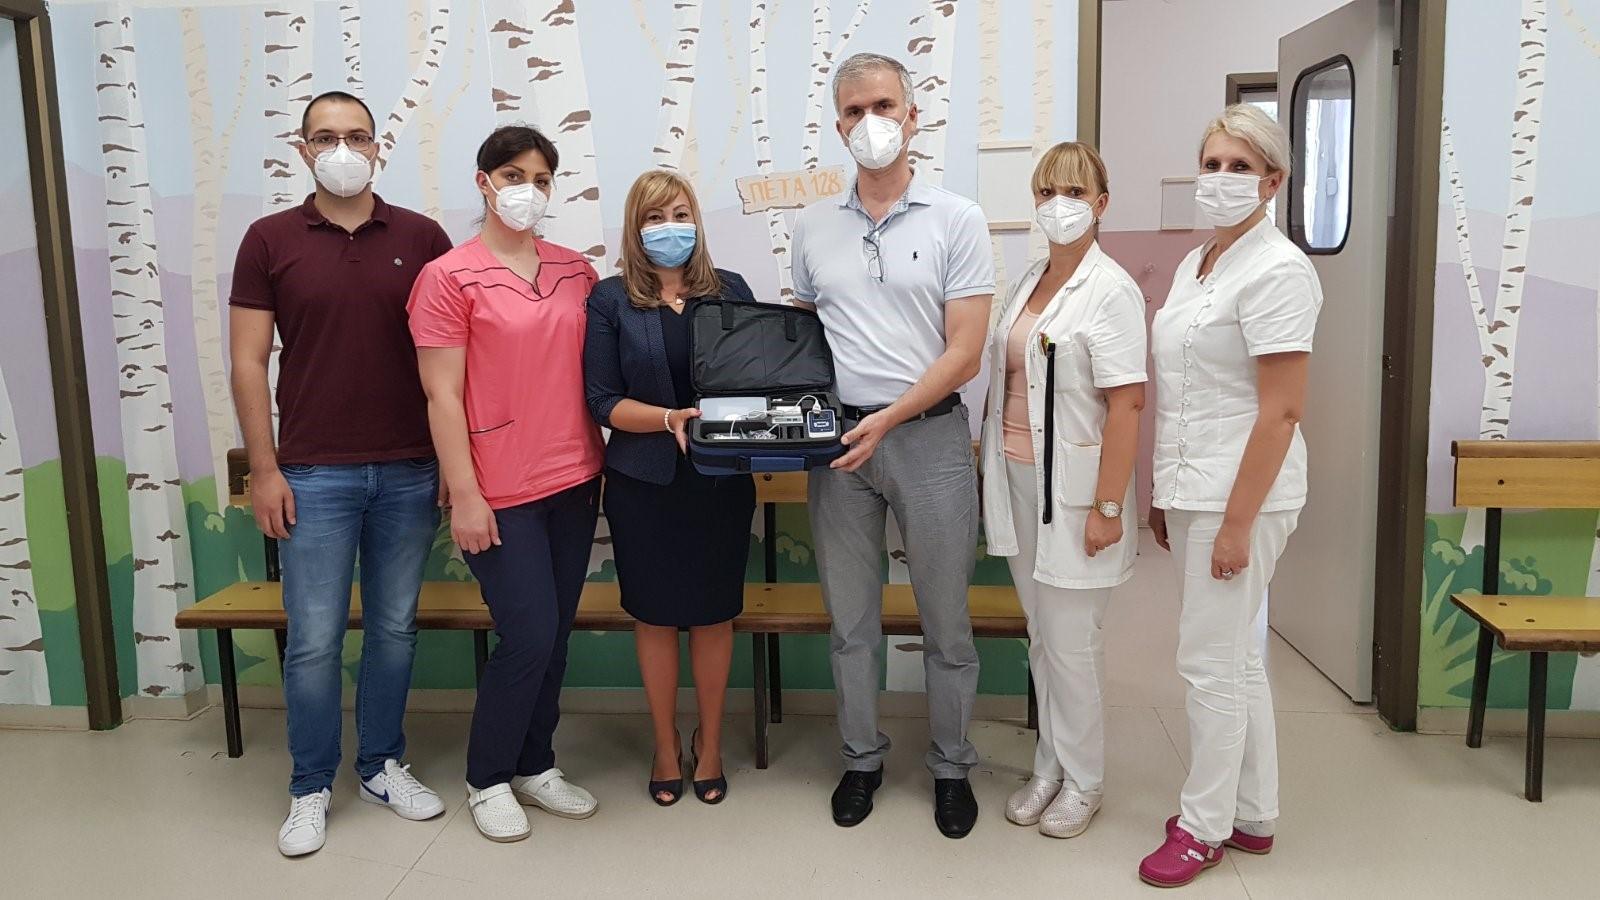 DOCTOR OF SERBIAN ORIGIN DONATES THROUGH PRINCESS KATHERINE FOUNDATION TWO HEARING SCREENING EQUIPMENT